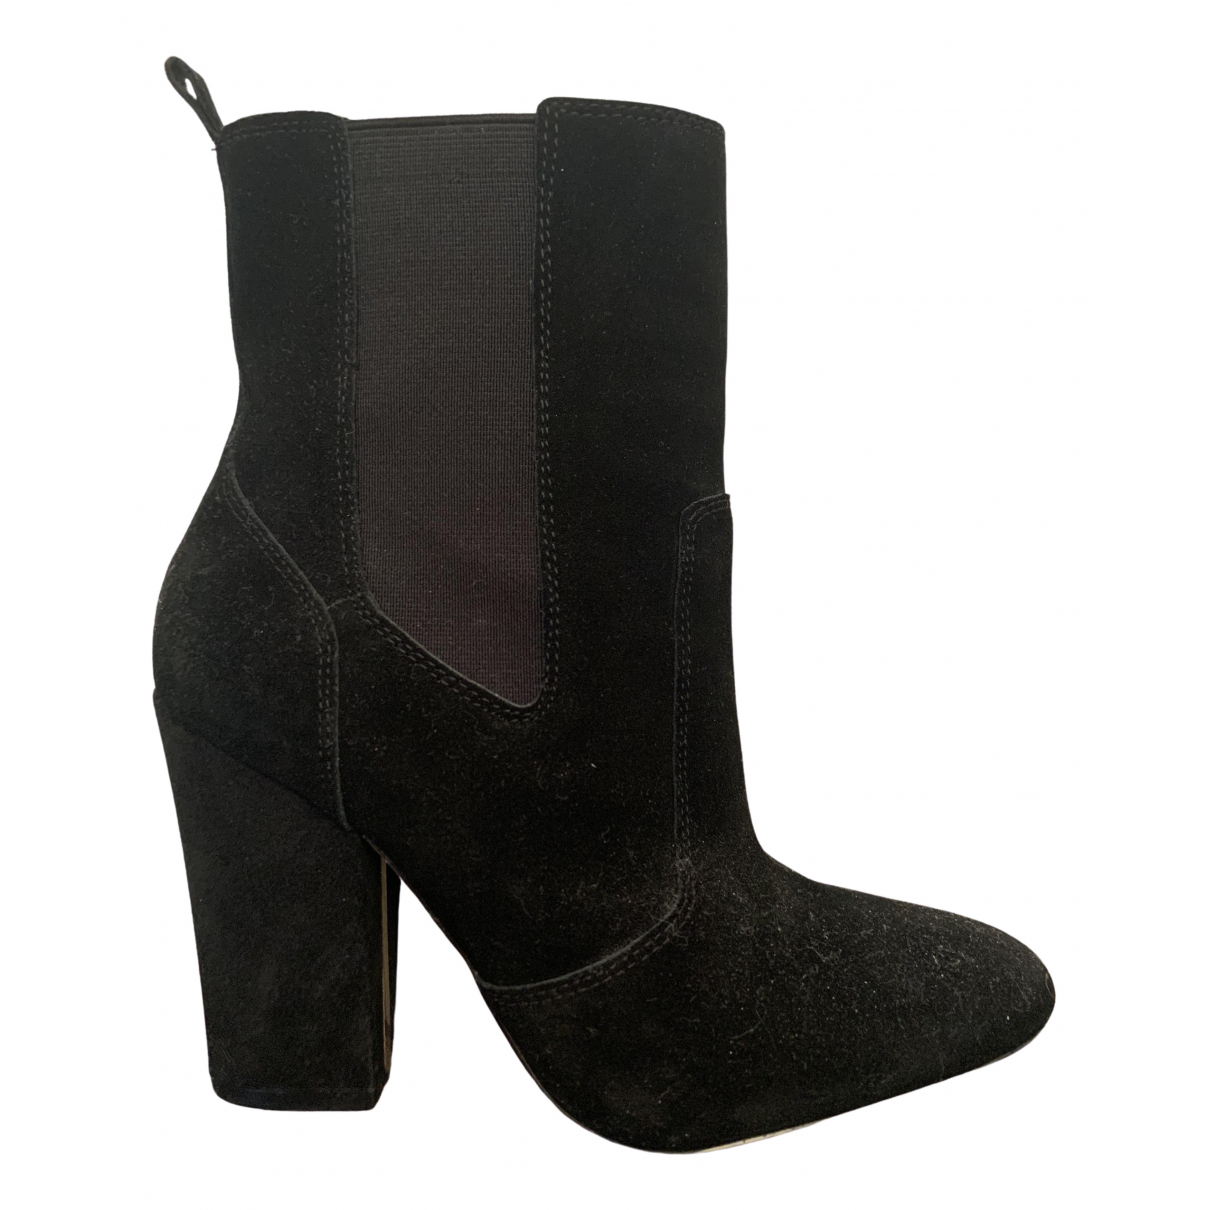 Massimo Dutti \N Black Suede Boots for Women 37 EU